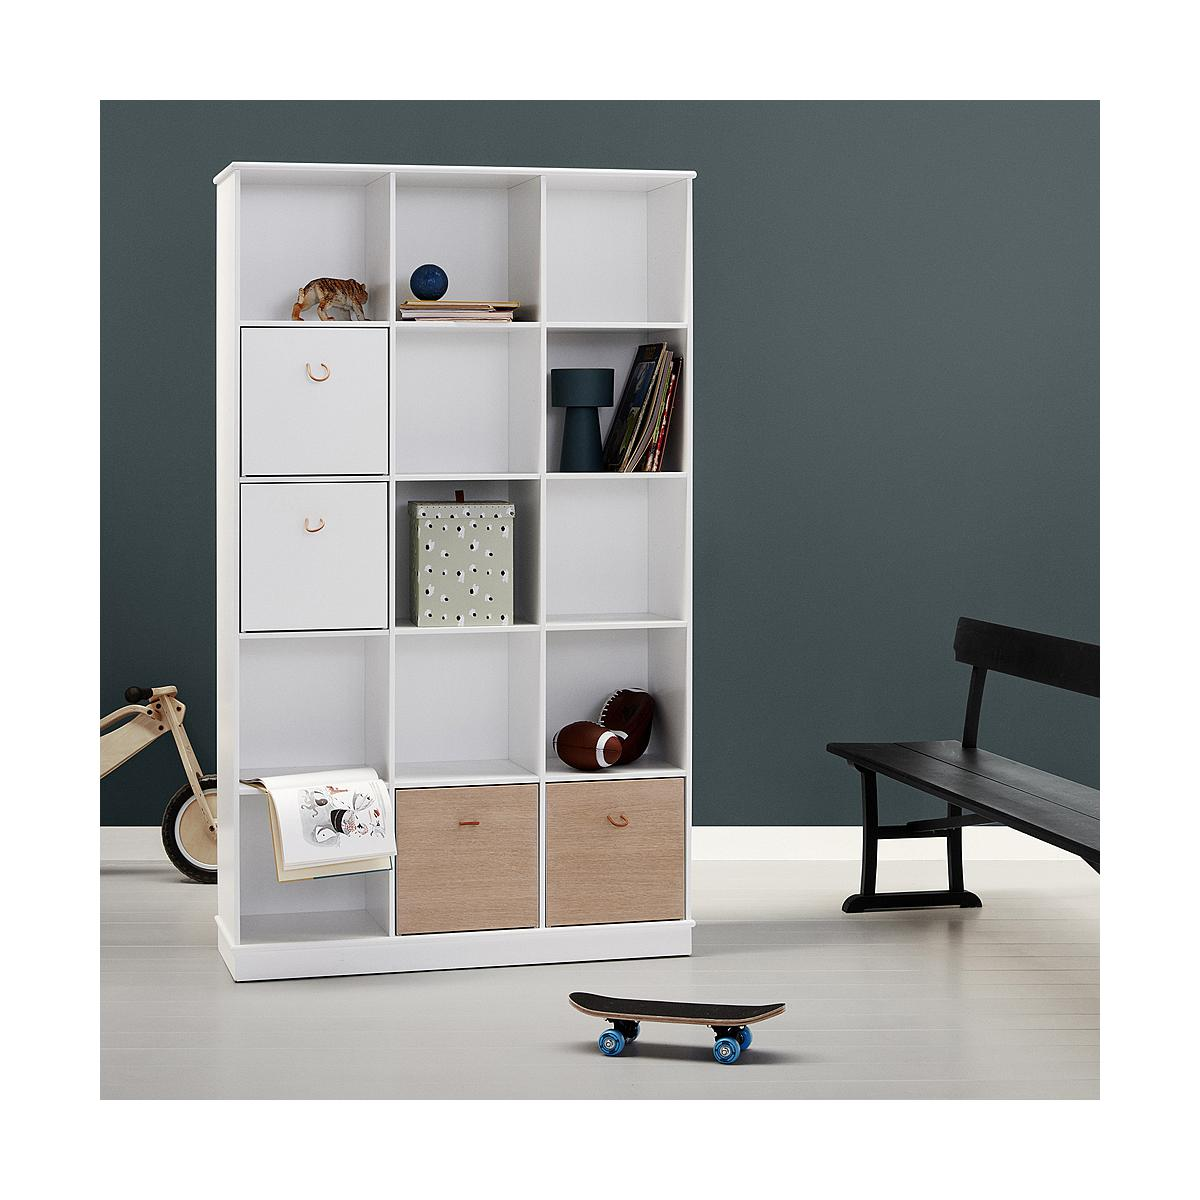 Regal 104x180cm WOOD Oliver Furniture weiß